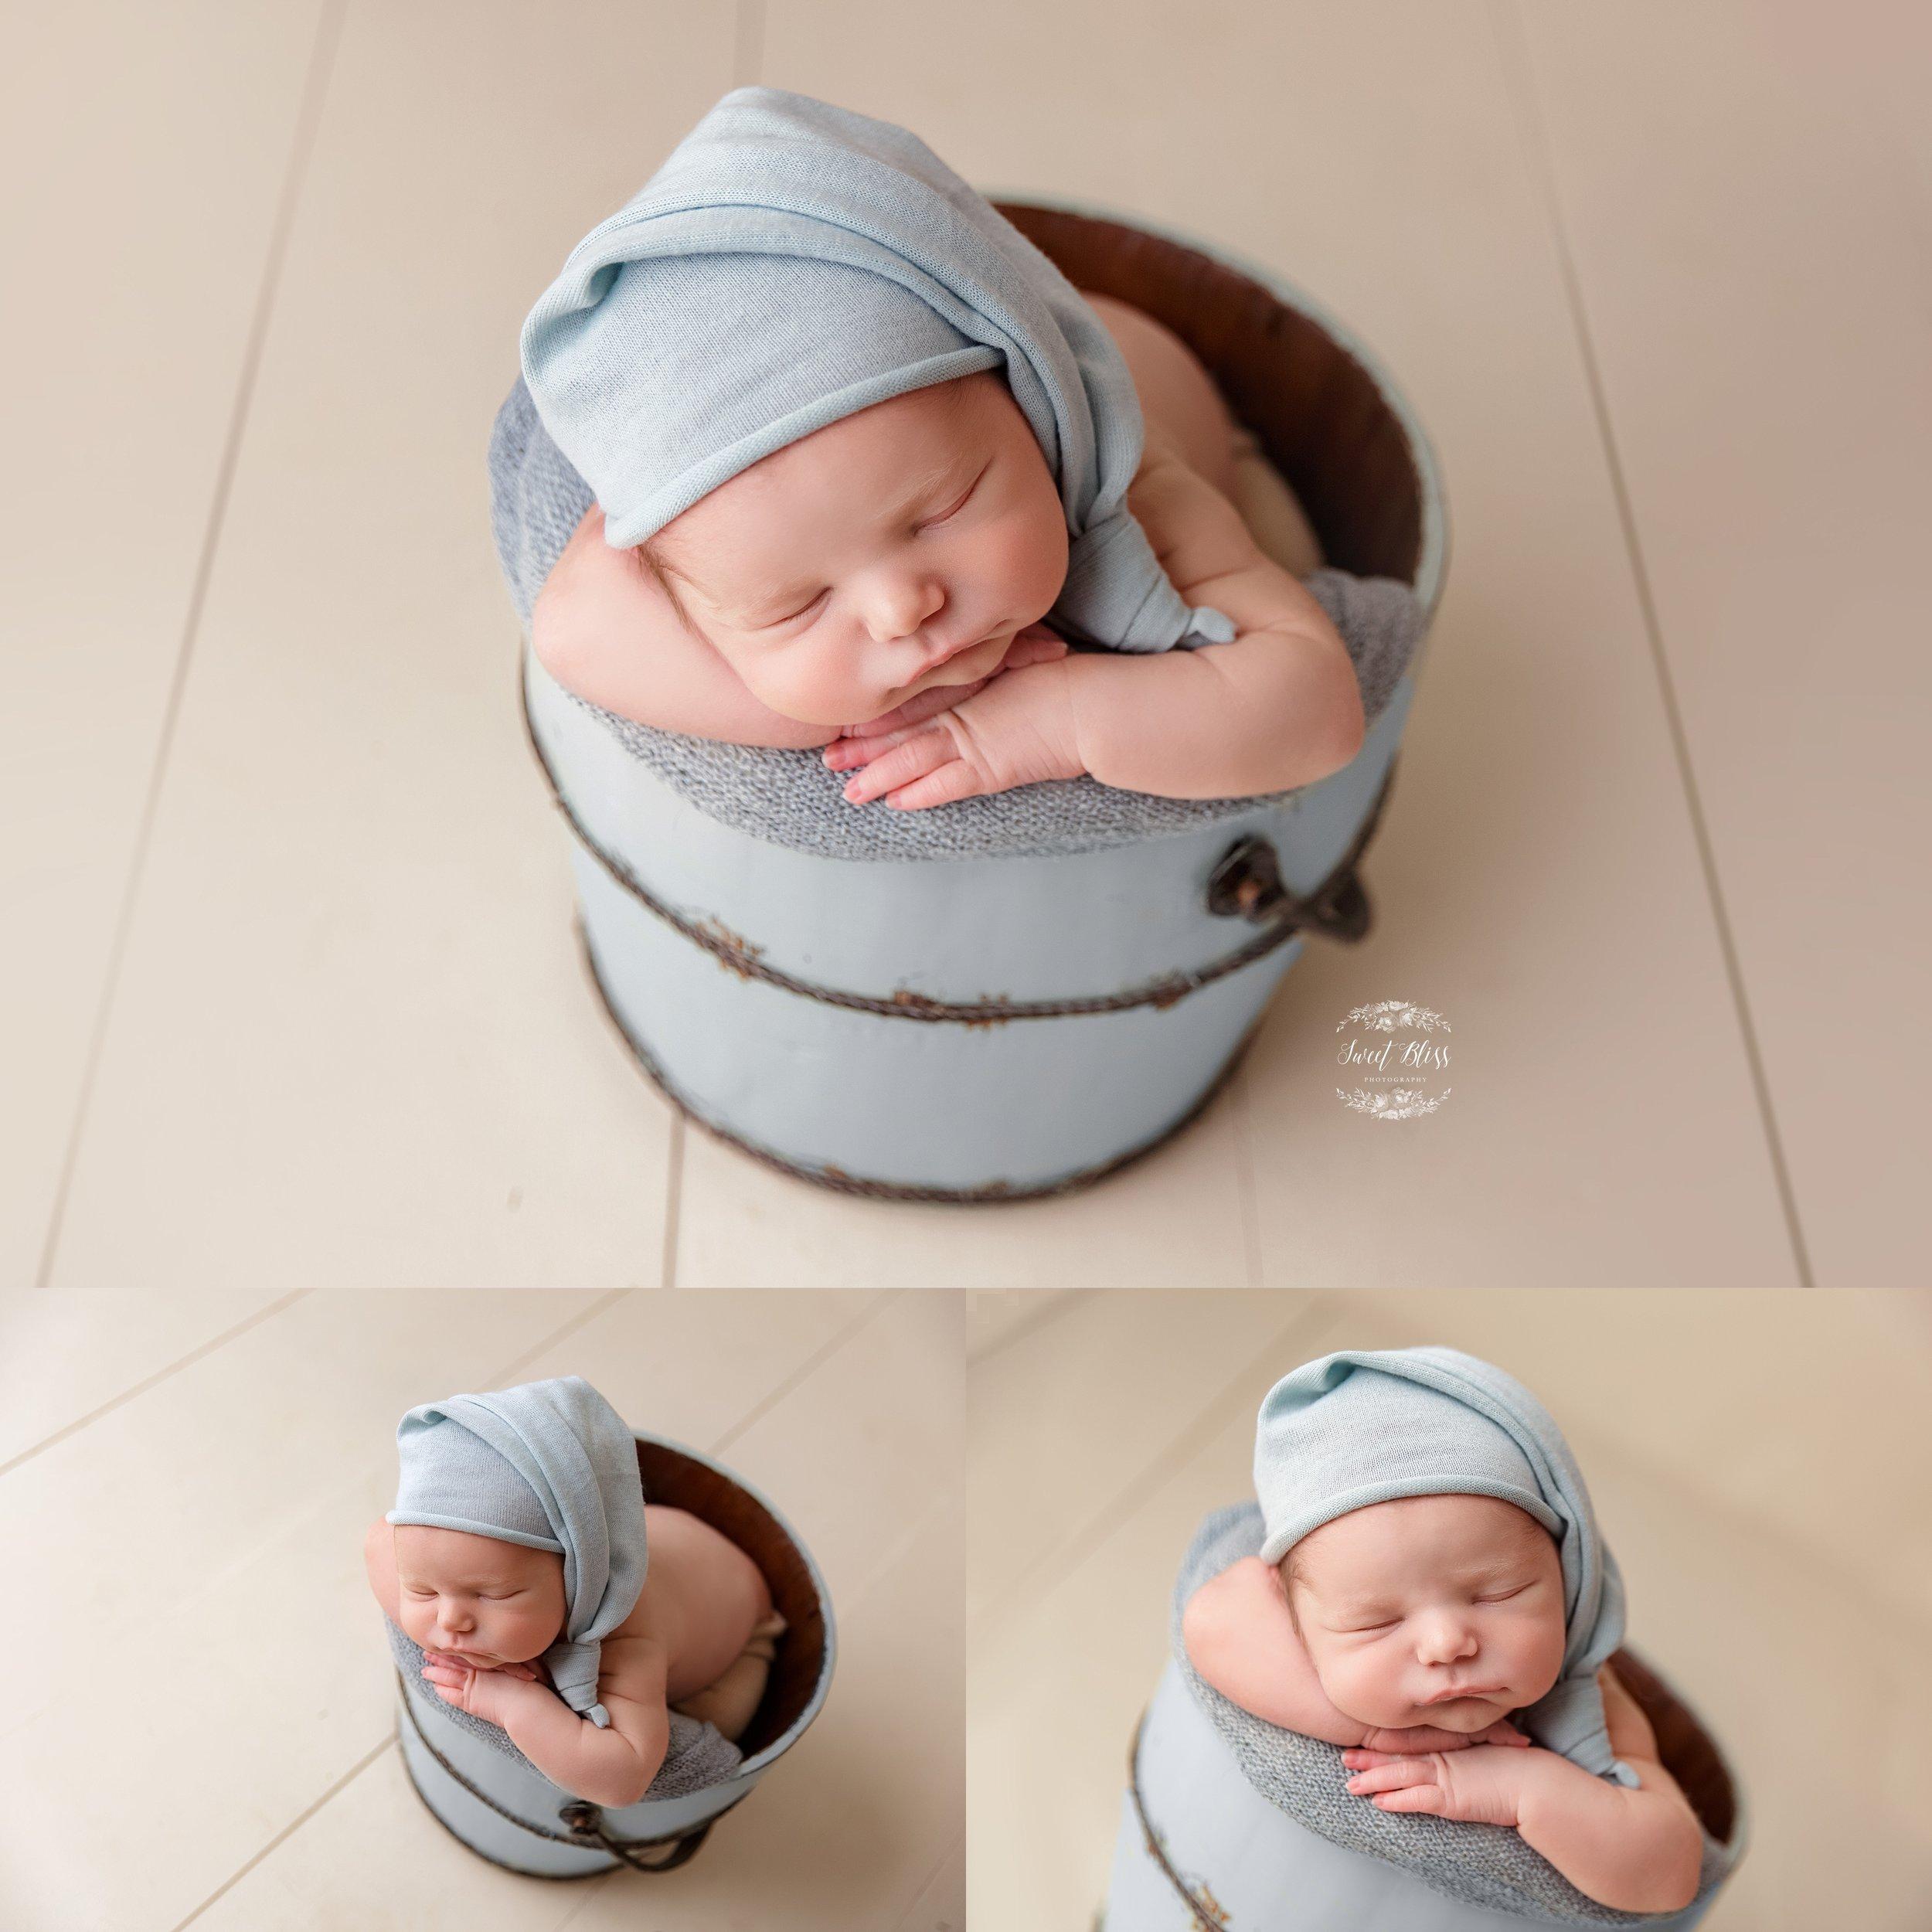 sweetblissphotography_bluebucket_newbornboy1.jpg